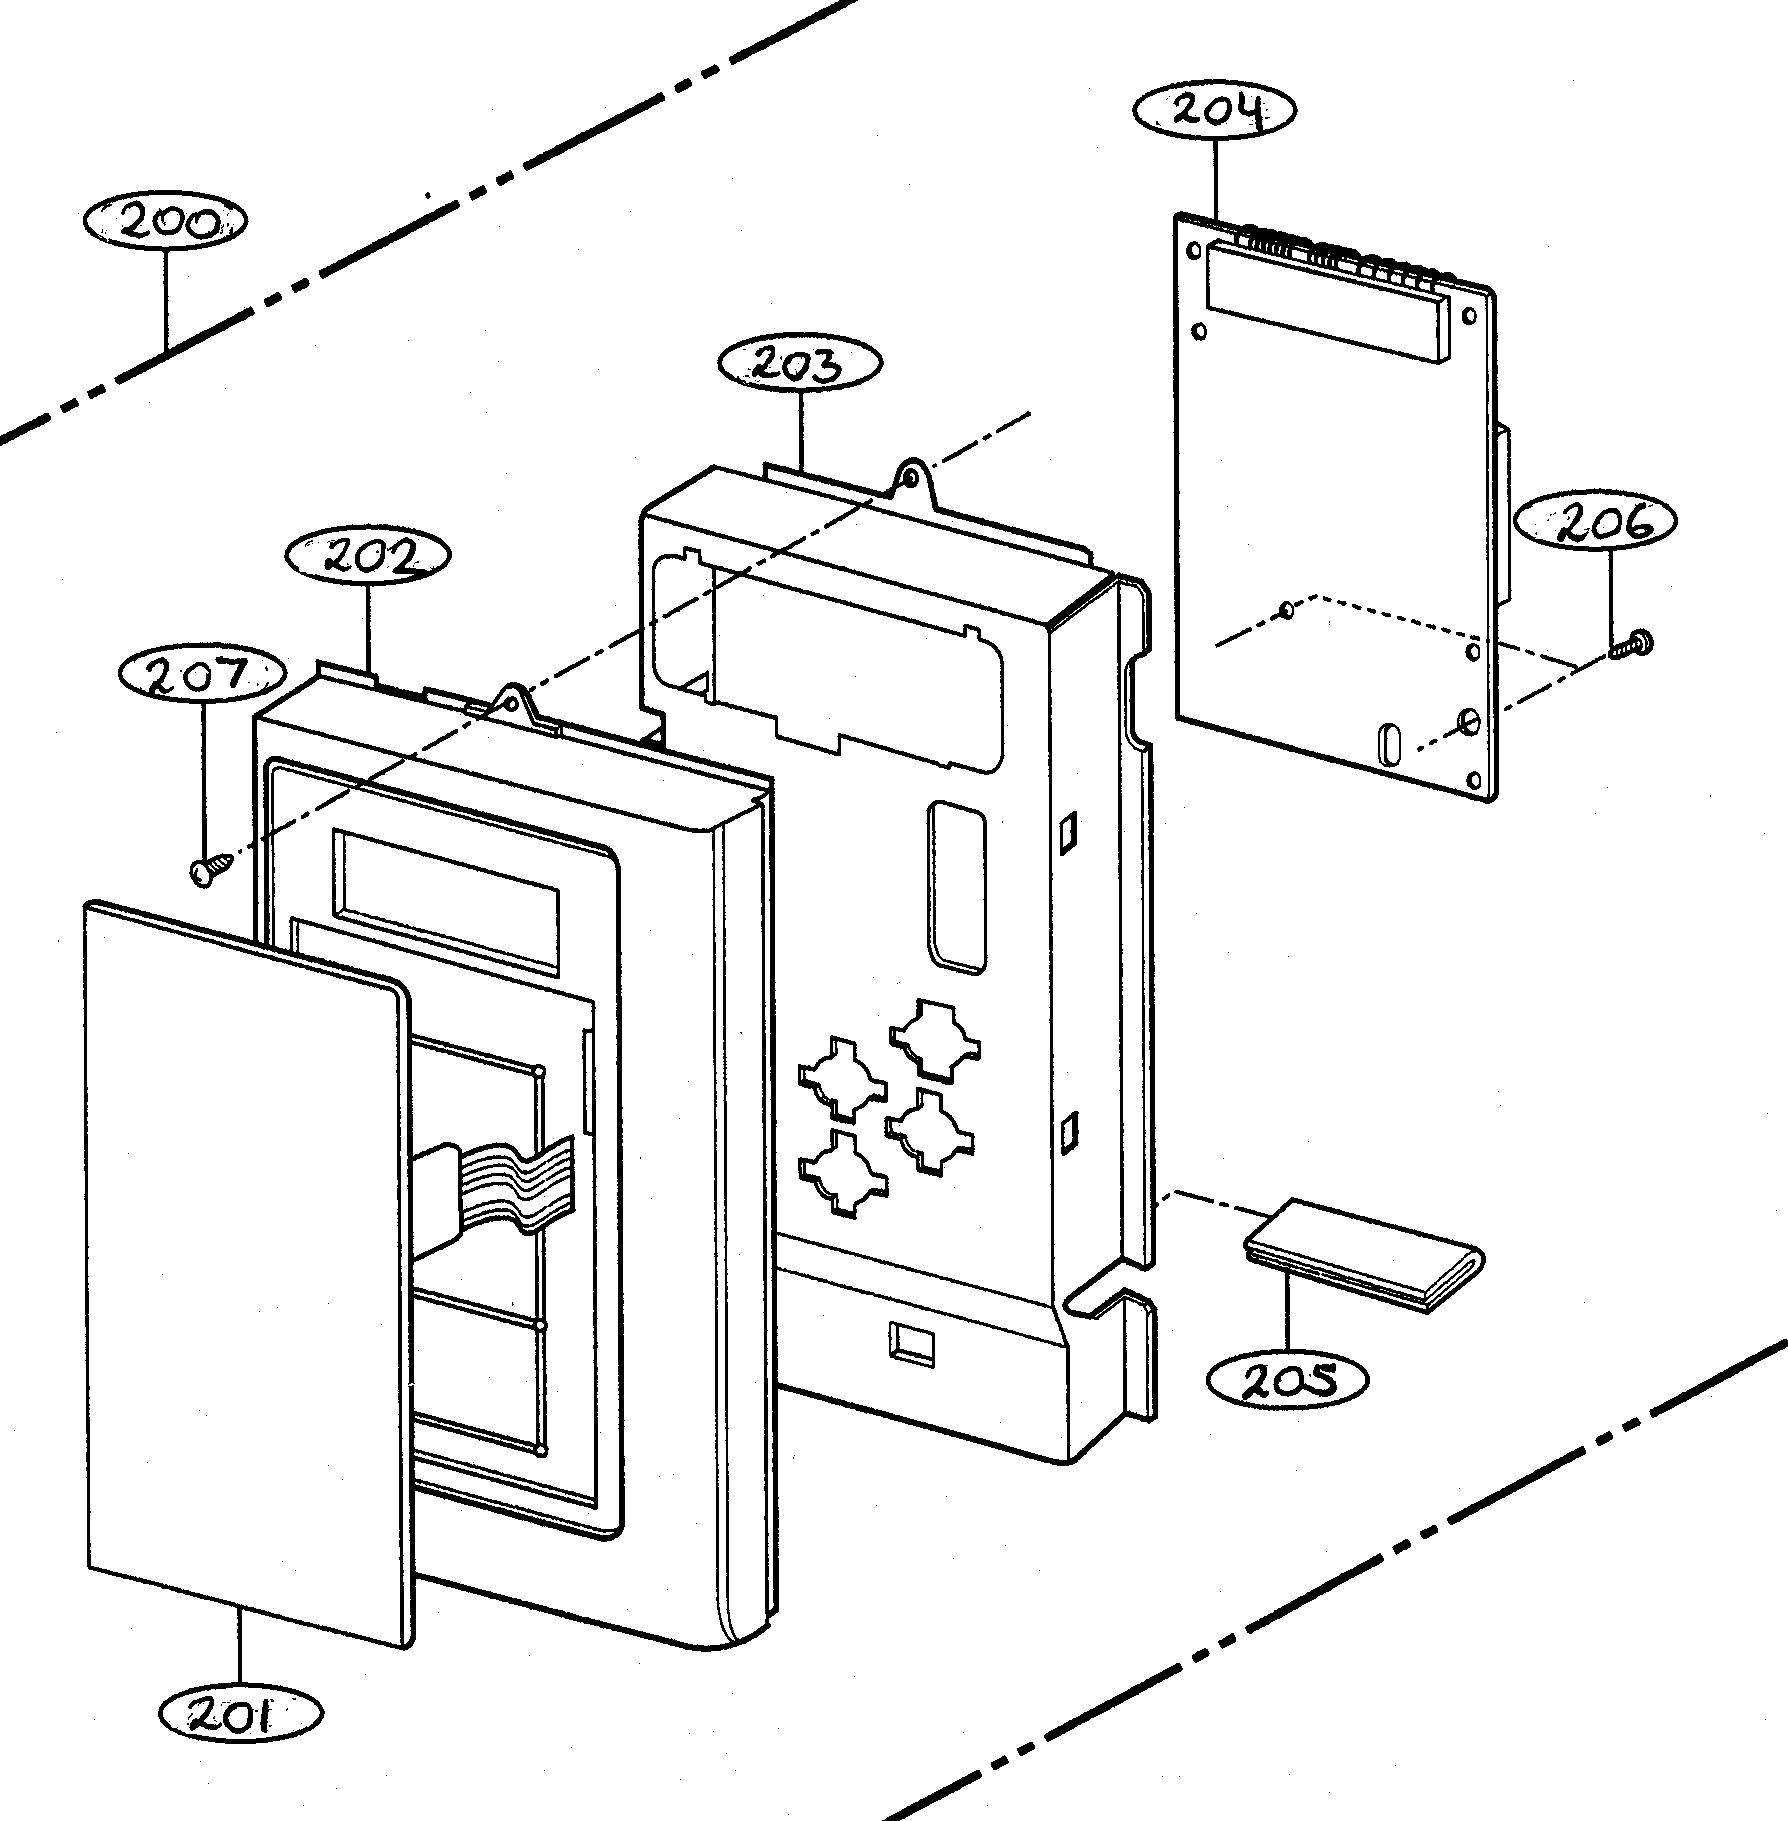 Goldstar model MV-1526W microwave/hood combo genuine parts